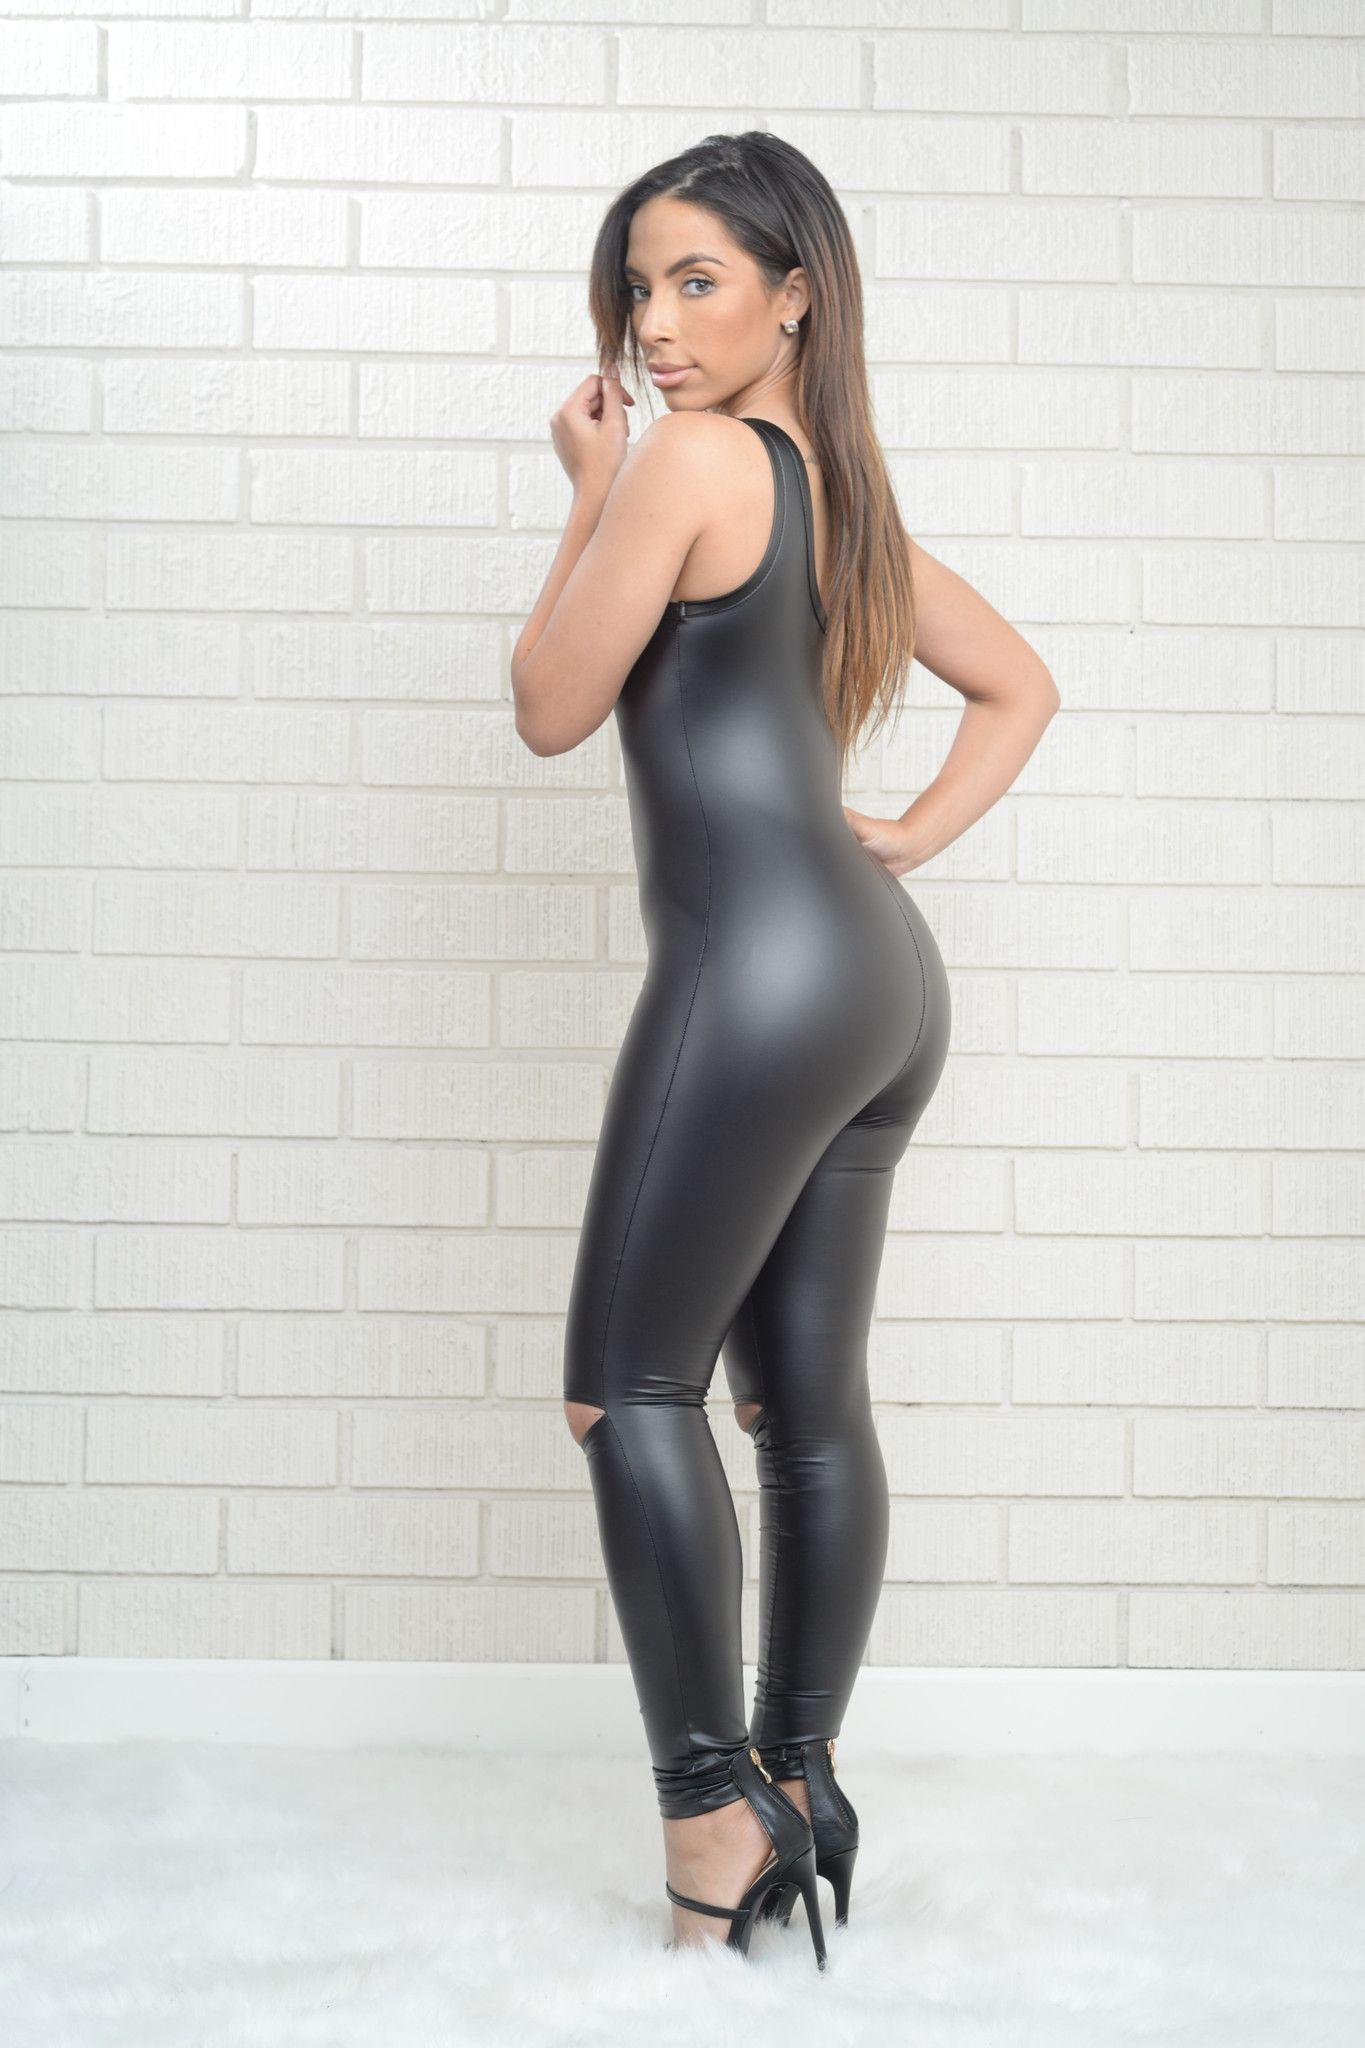 Cat Burglar Jumpsuit Black Black jumpsuit, Jumpsuit